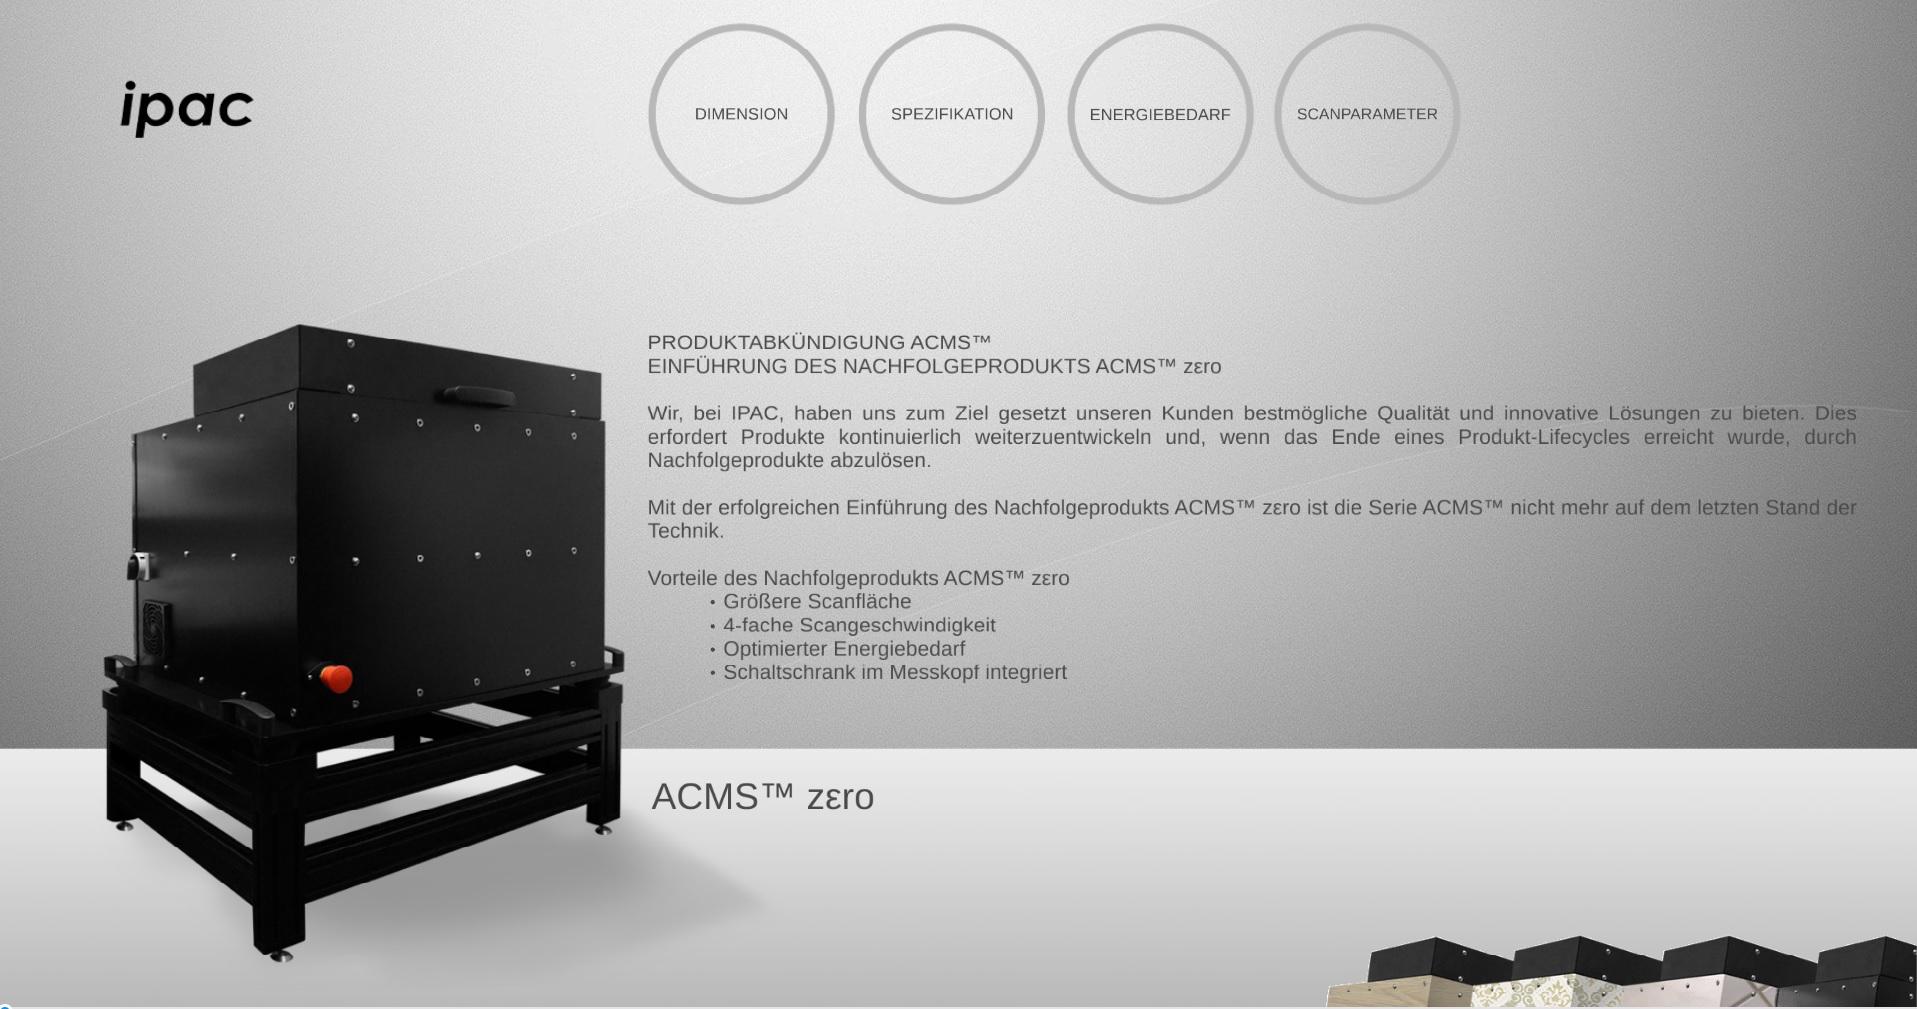 Produktabkündigung ACMS™